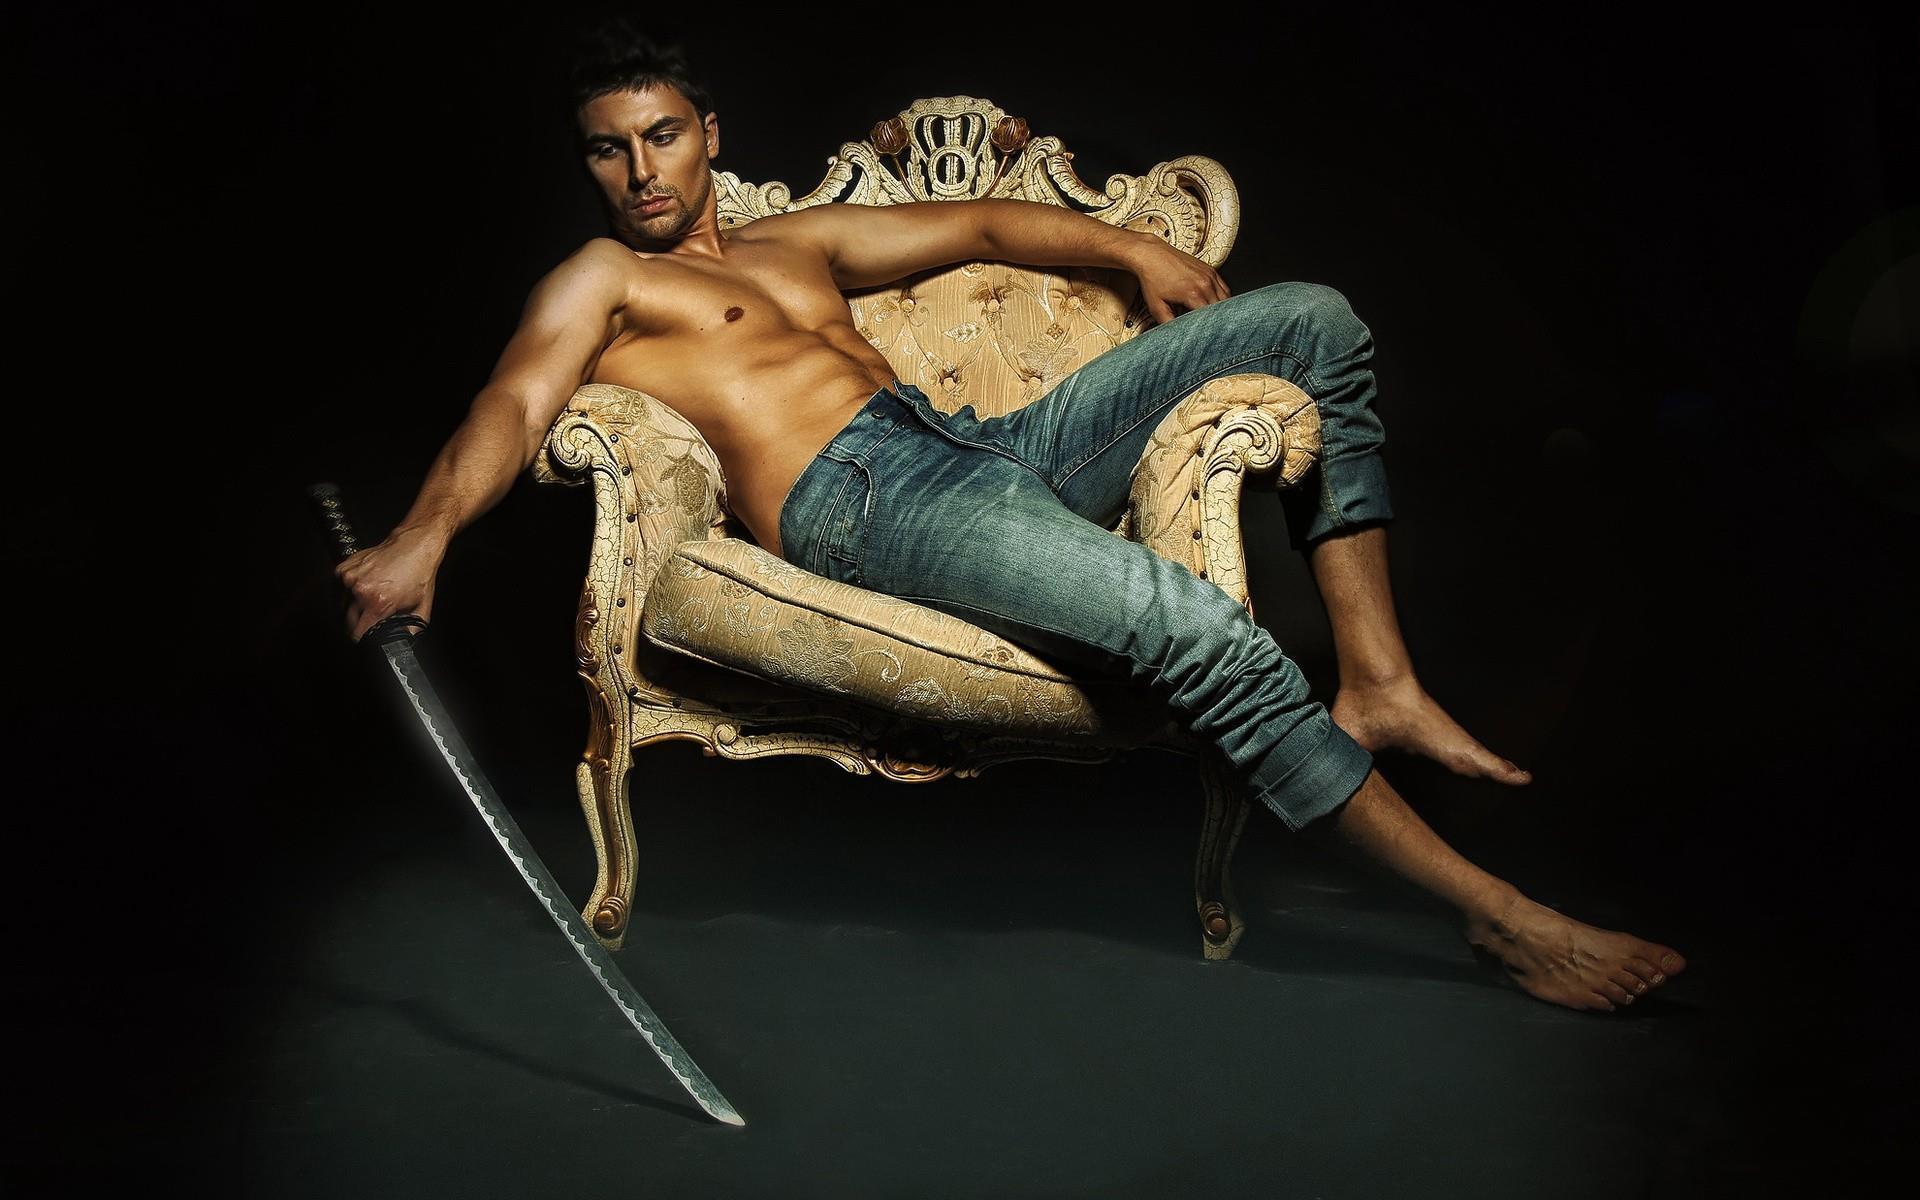 fond-ecran_top-modele-homme-super-sexy_1